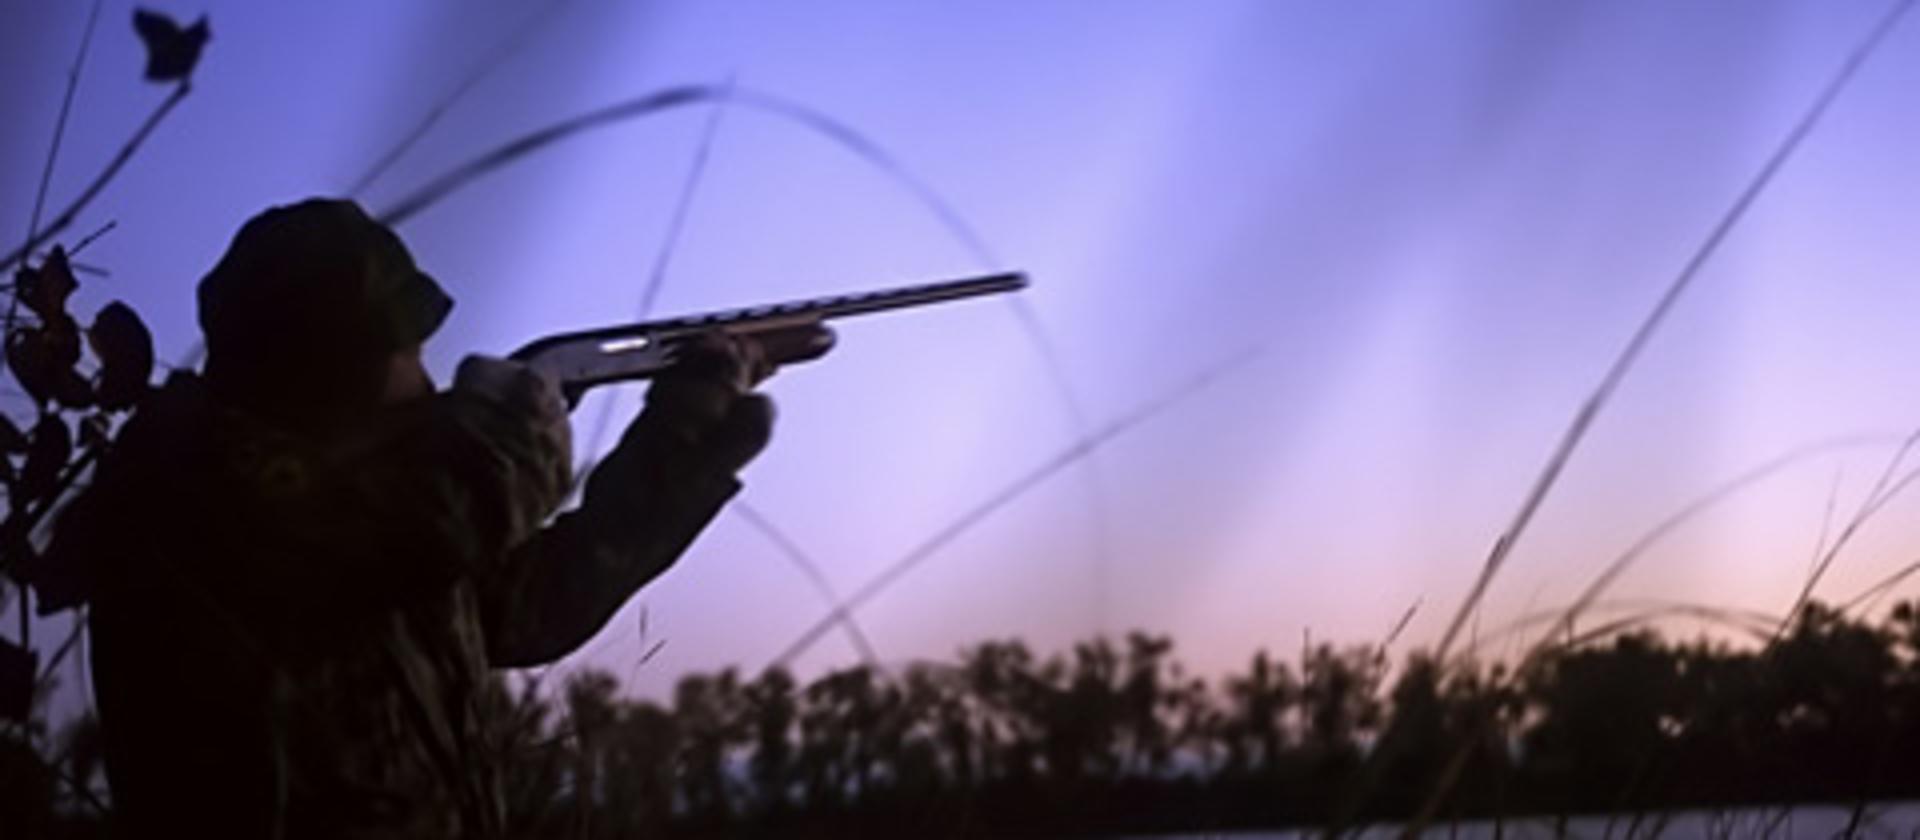 Hunter at sunrise